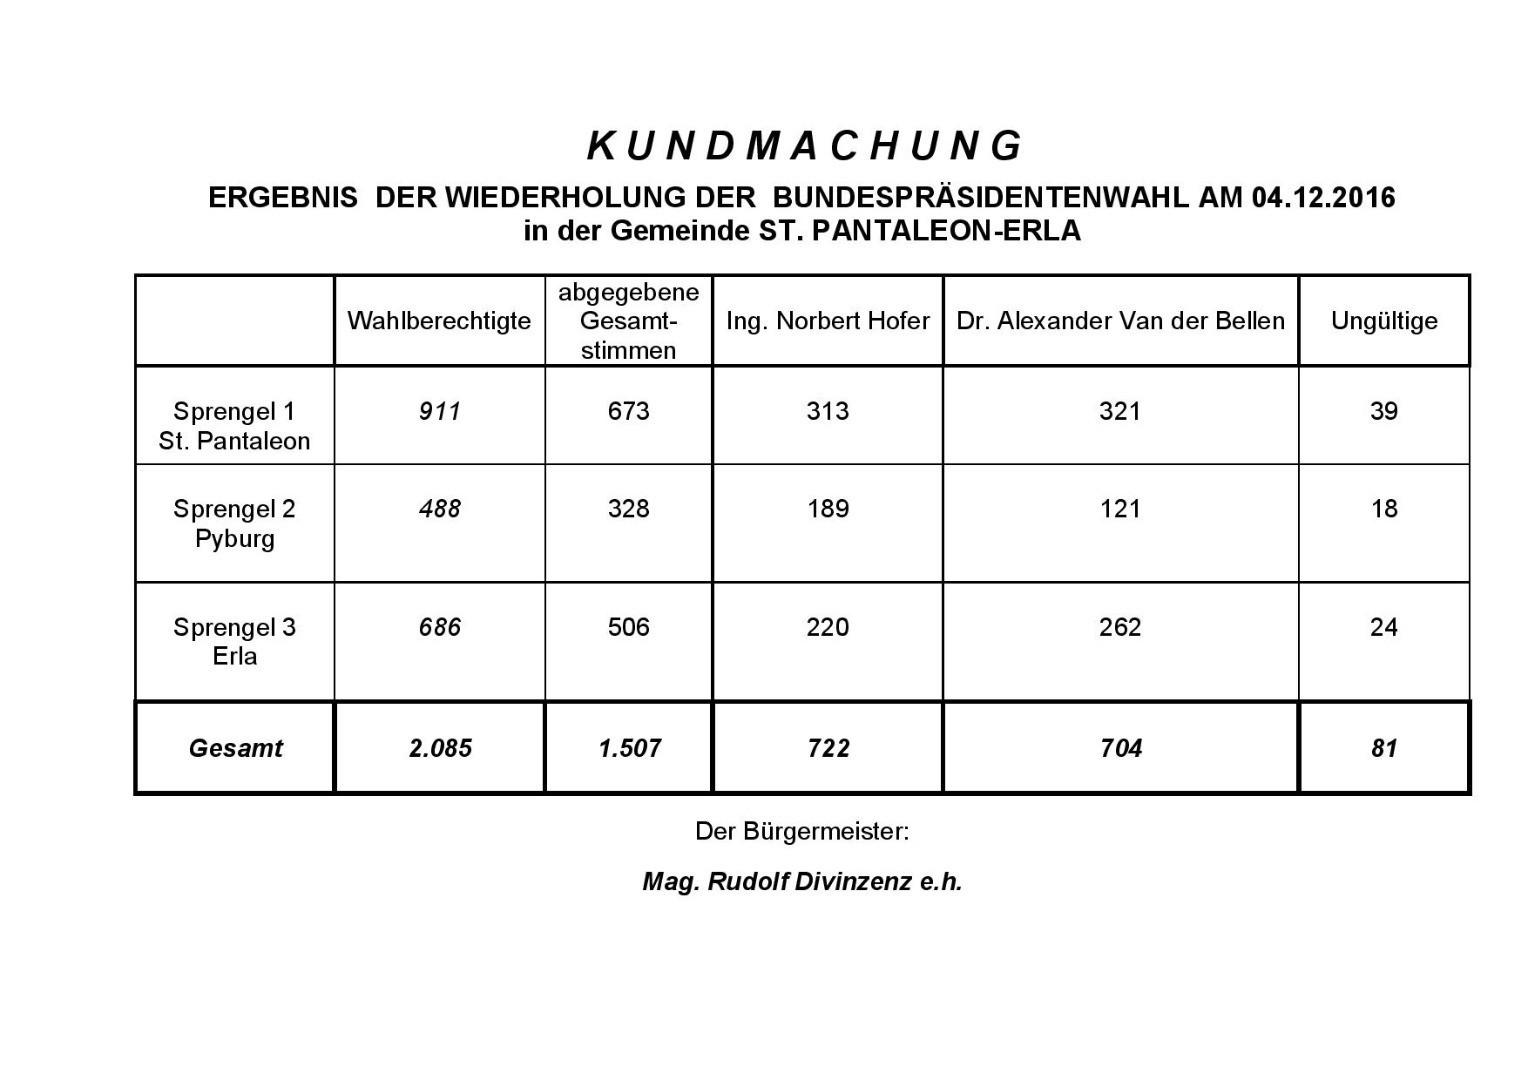 Kundmachung Ergebnis Wiederholung 2WG-page-001.jpg